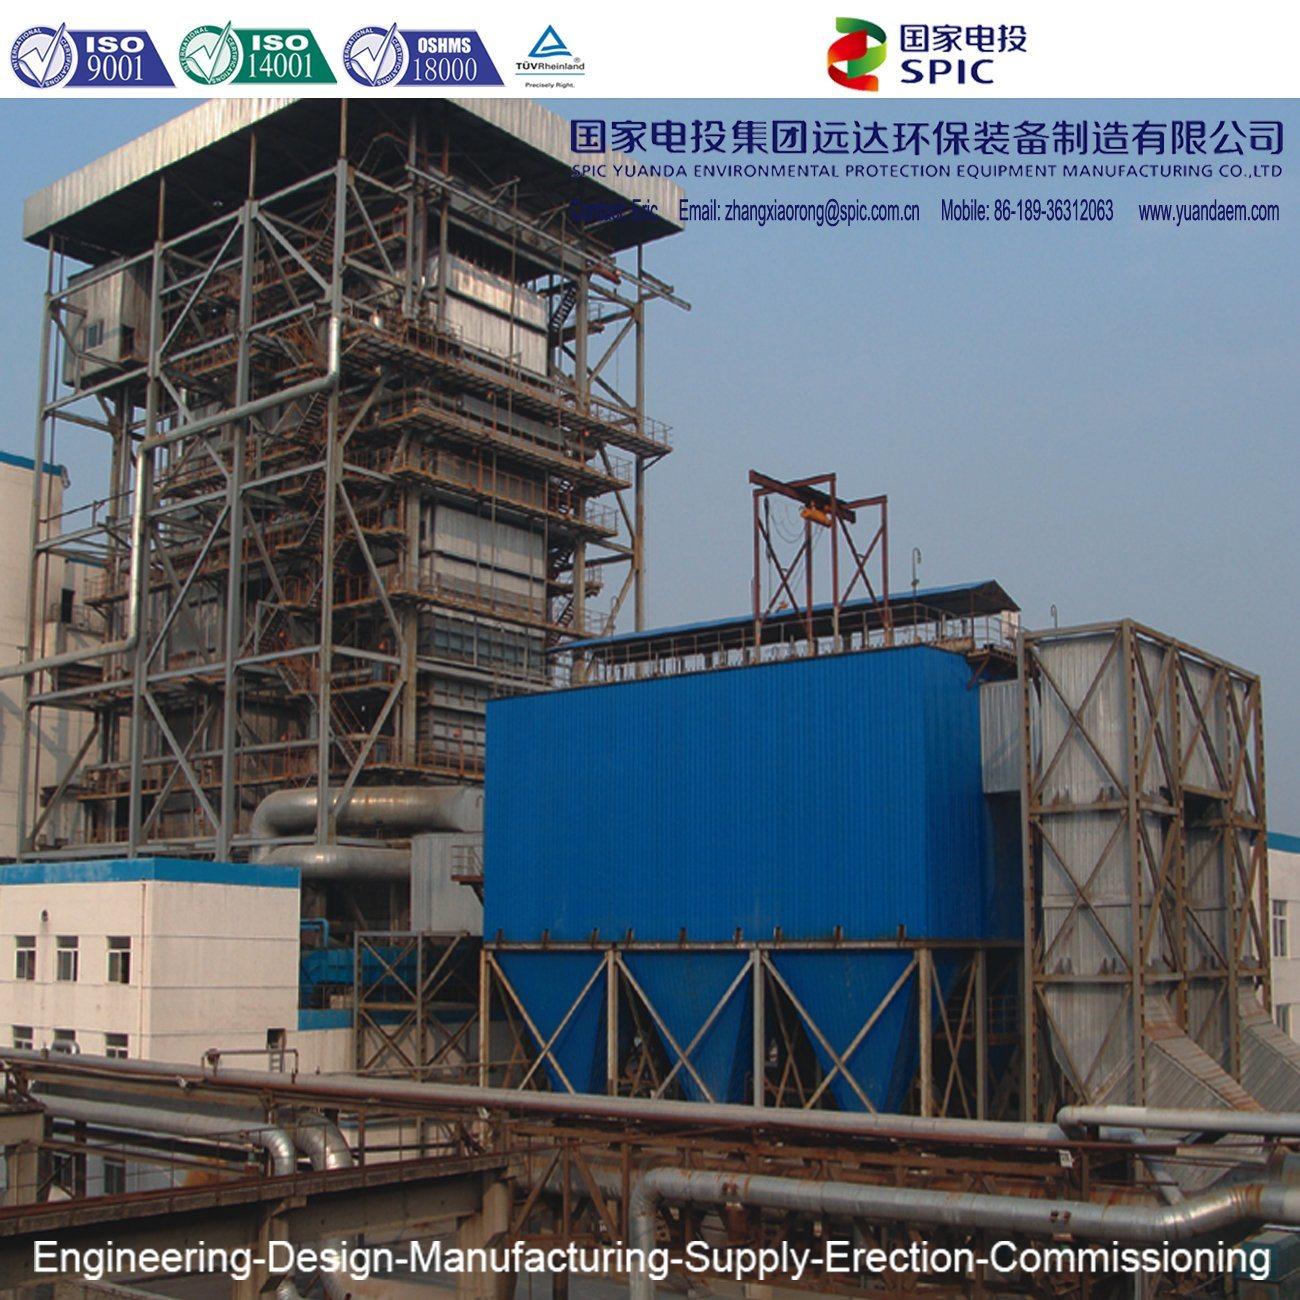 [Hot Item] Jdw-114 (ESP) Industrial Electrostatic Precipitator for 2X50 MW  Coal Fired Power Plant